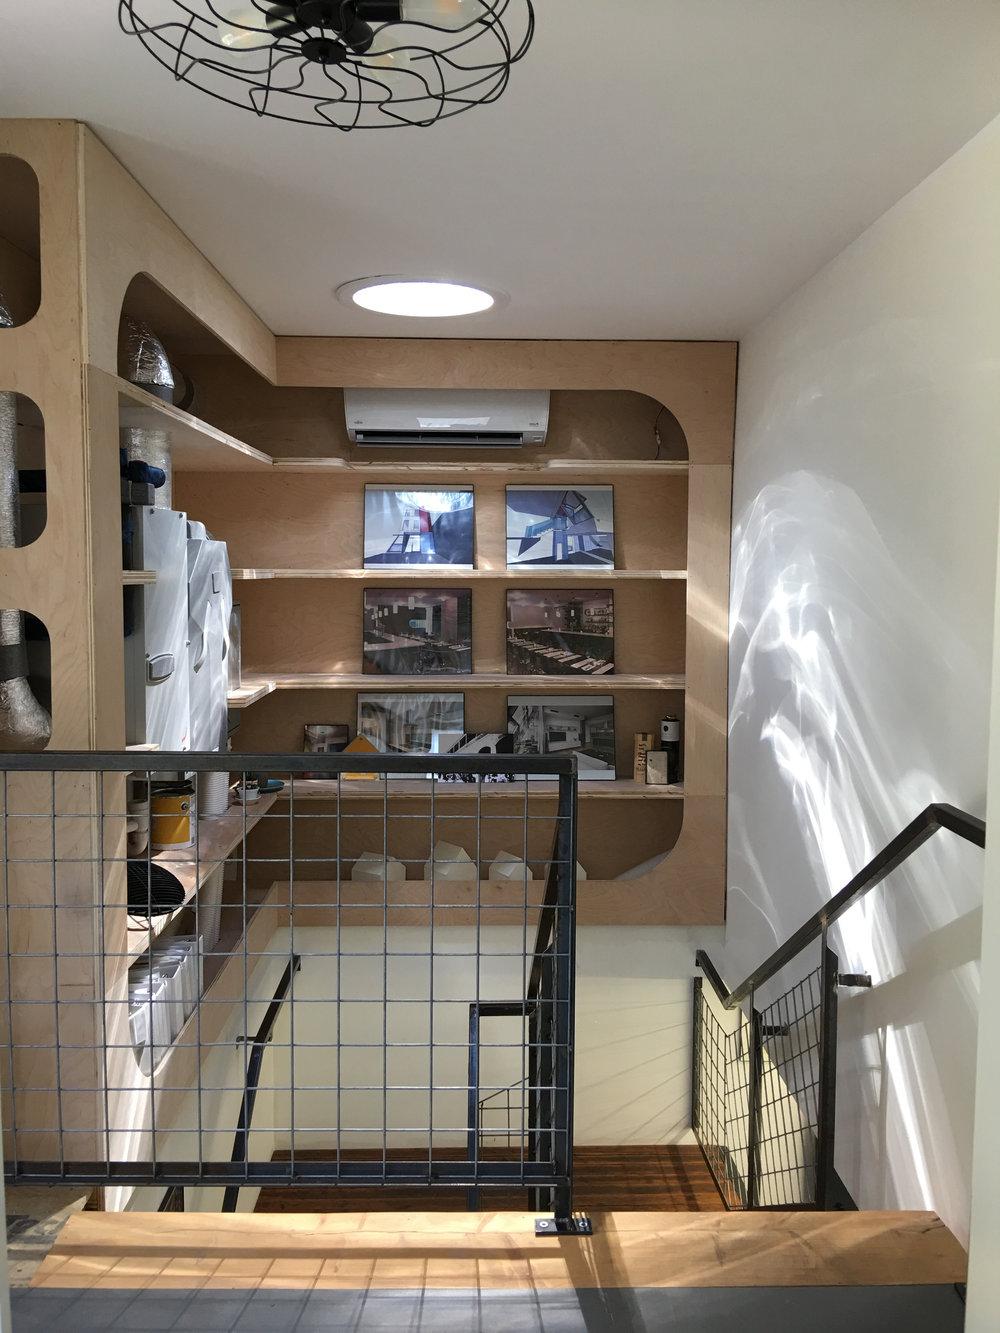 04_178 Main Street_Interior - Stair from 2nd Floor.jpg